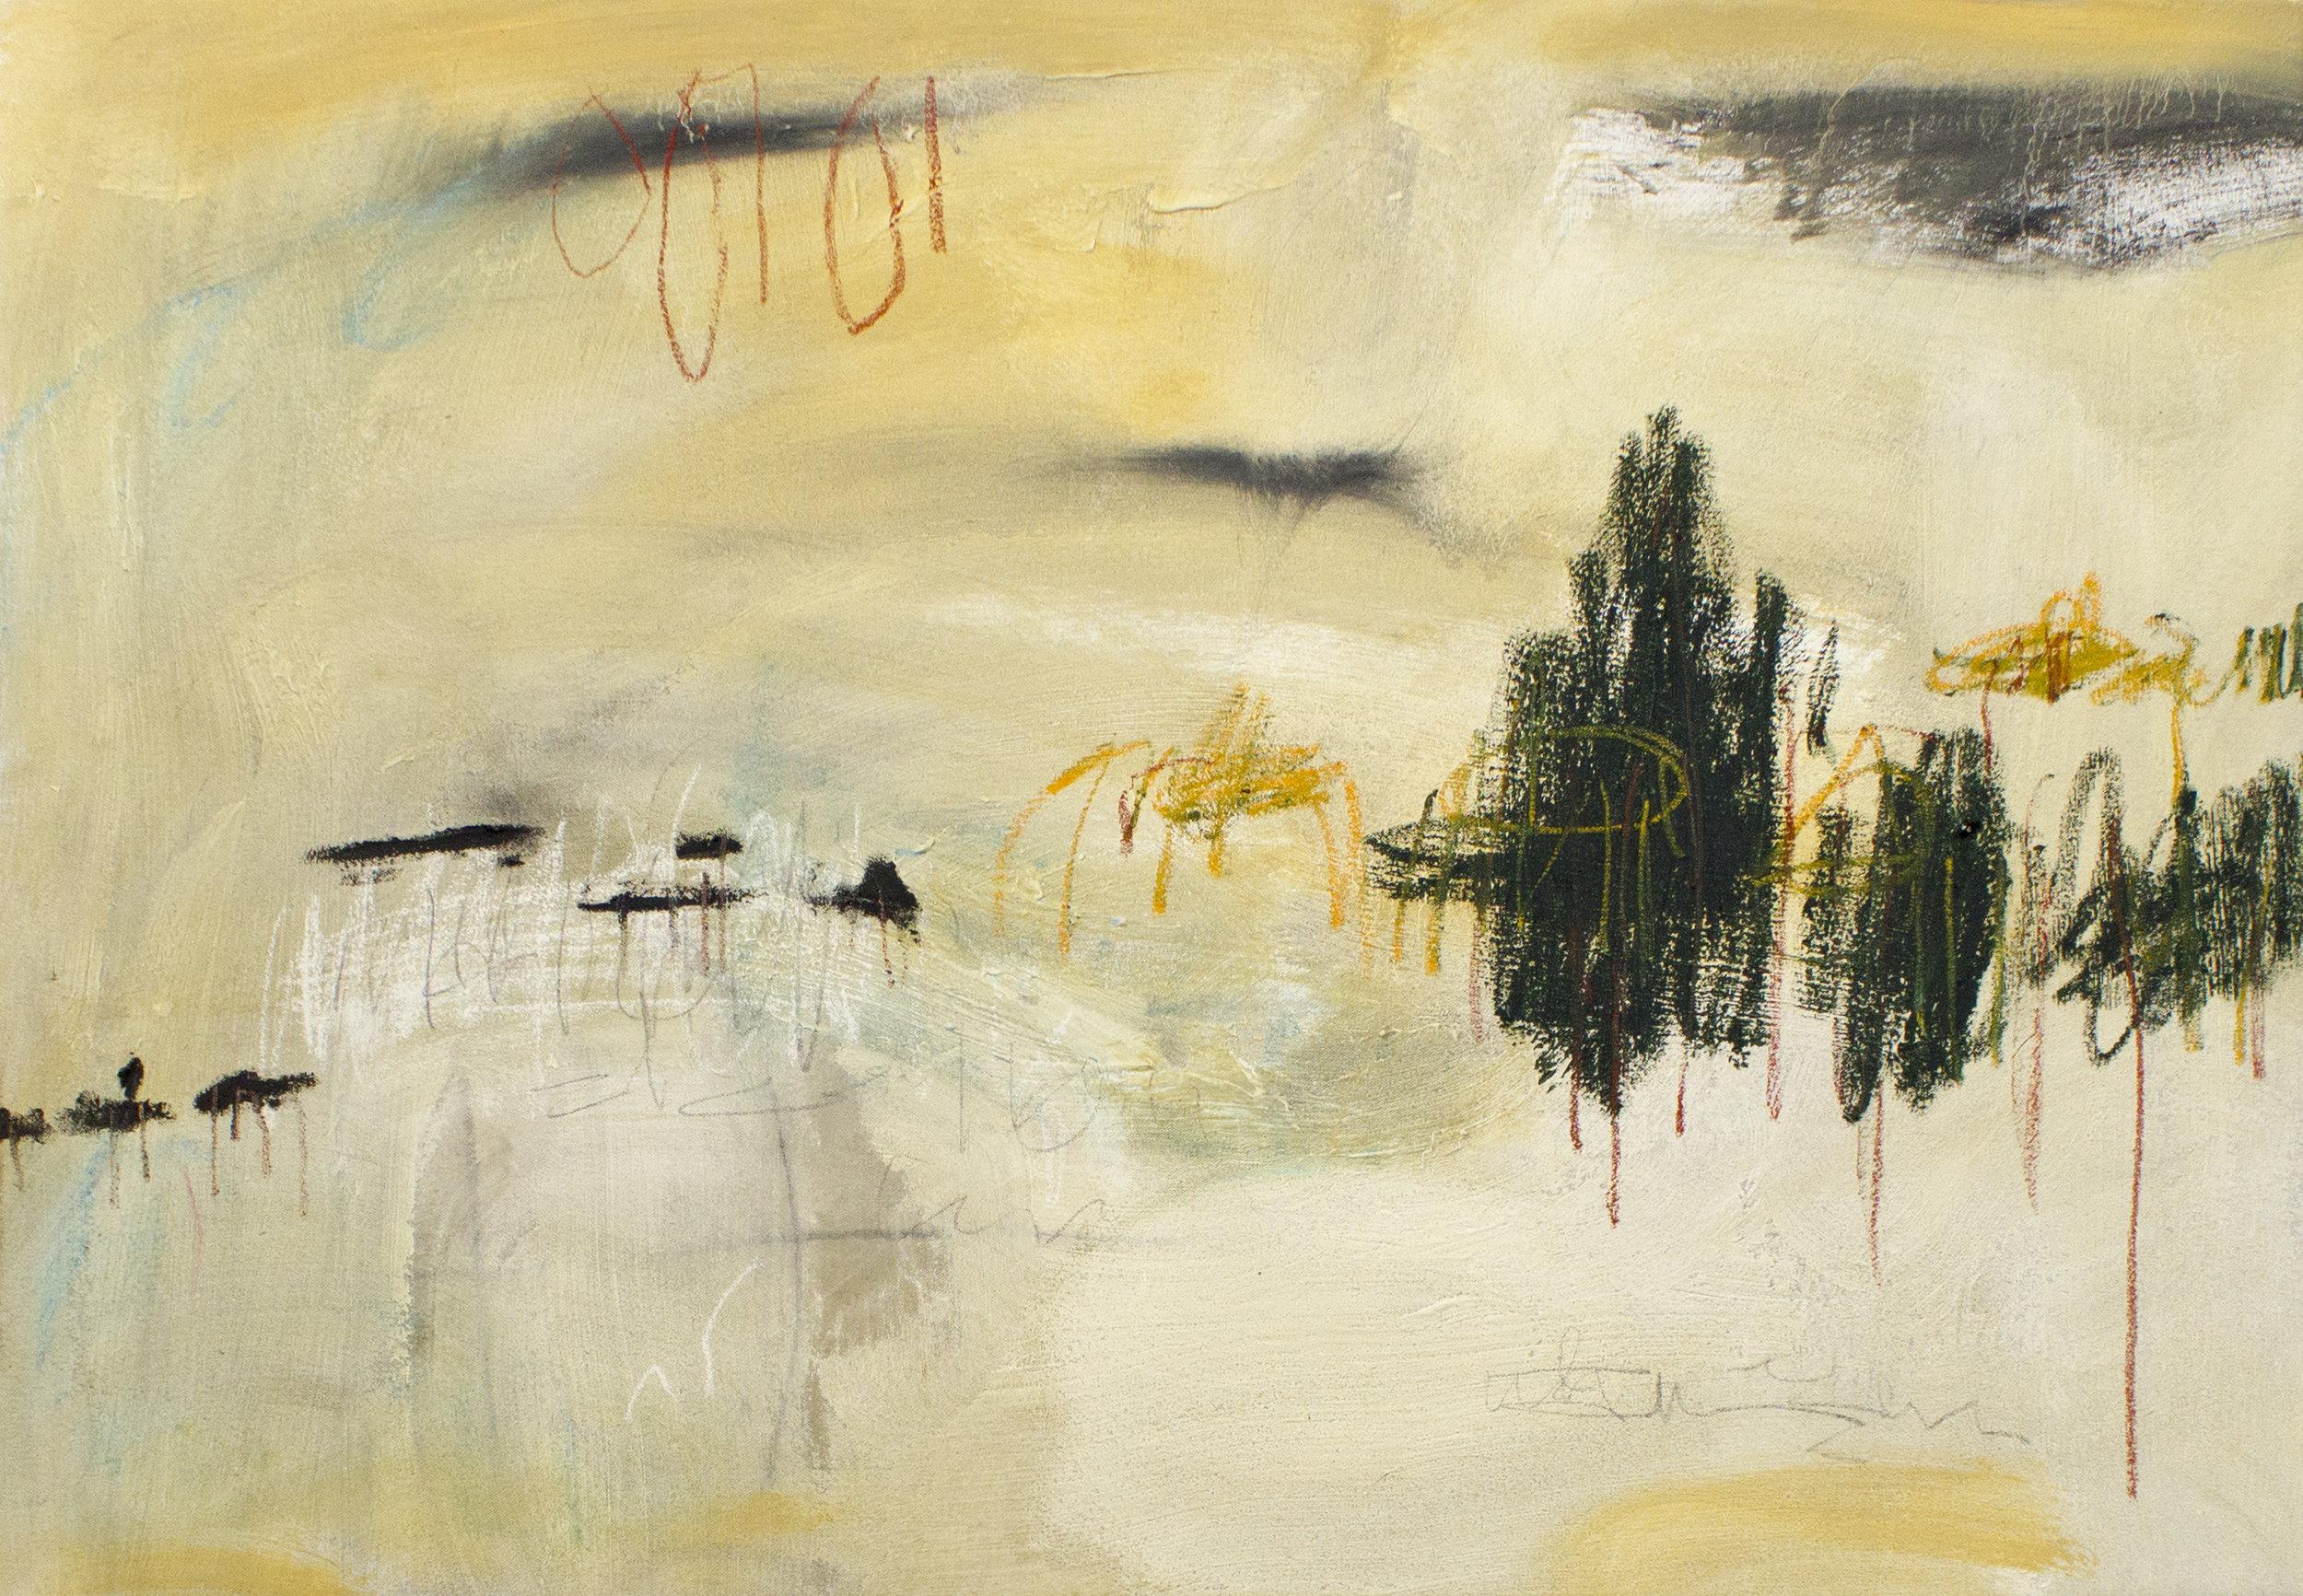 La Dispute de L'homme , 2018  28 x 40 Inches  Oil, Acrylic, Oil Stick, Oil Pastel, Colored Pencil, Graphite and Chalk Pastel on Canvas